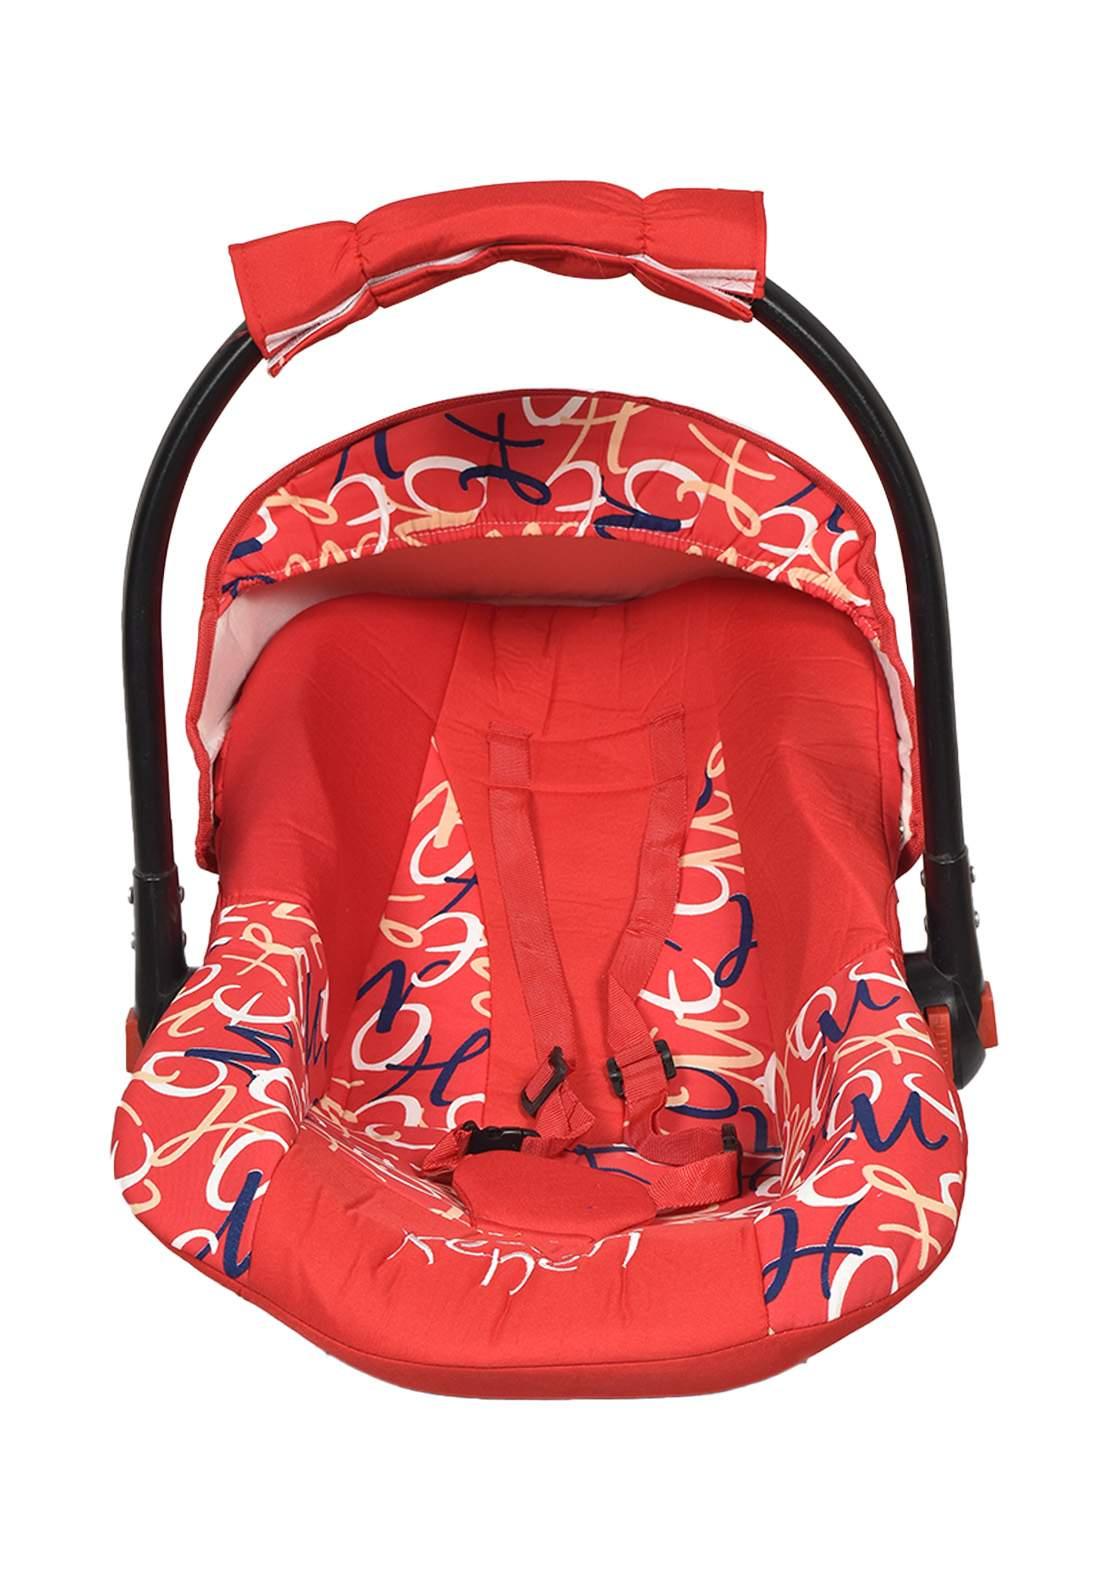 Baby Car Seat كرسي سيارة للأطفال